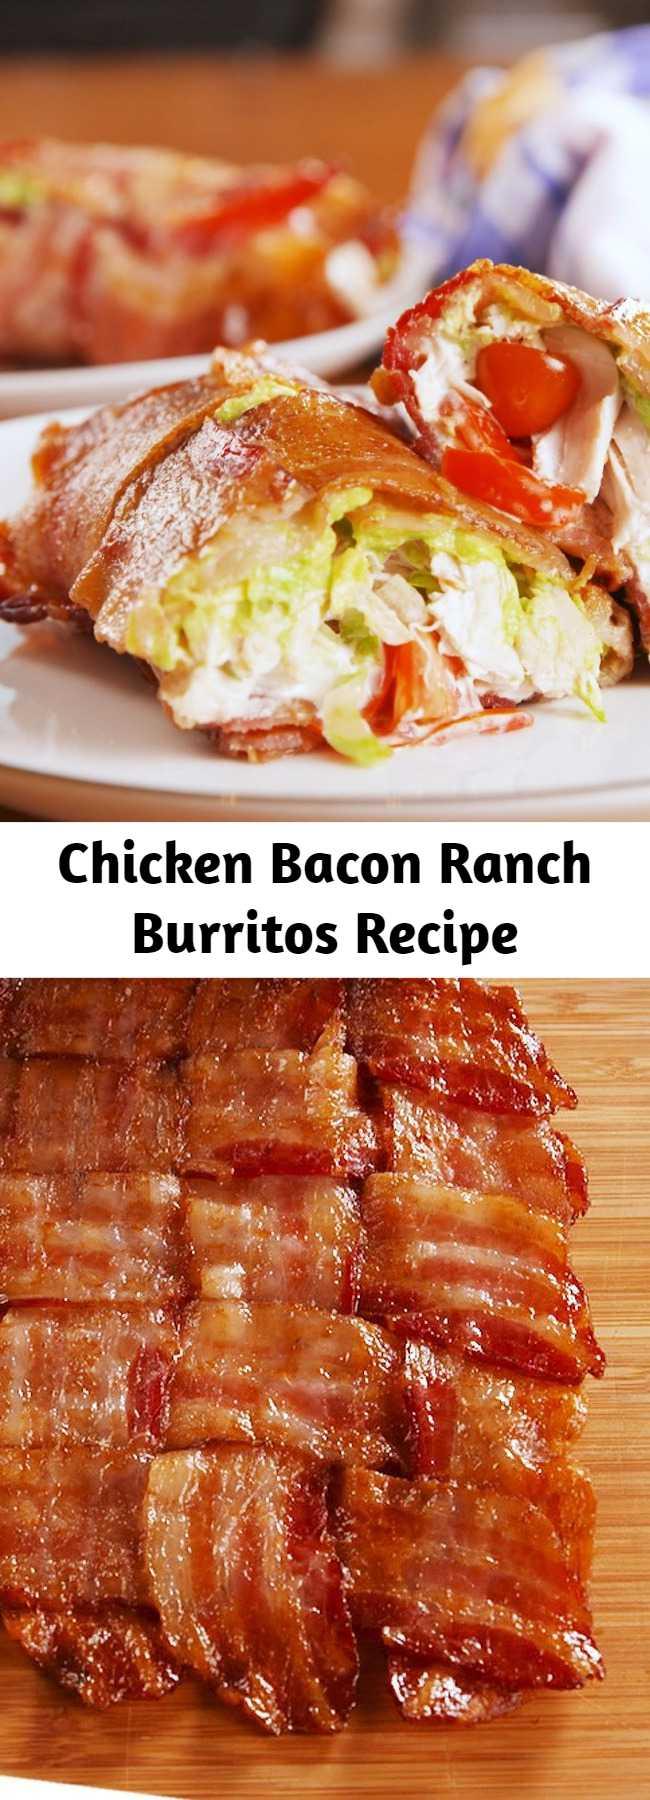 Chicken Bacon Ranch Burritos Recipe